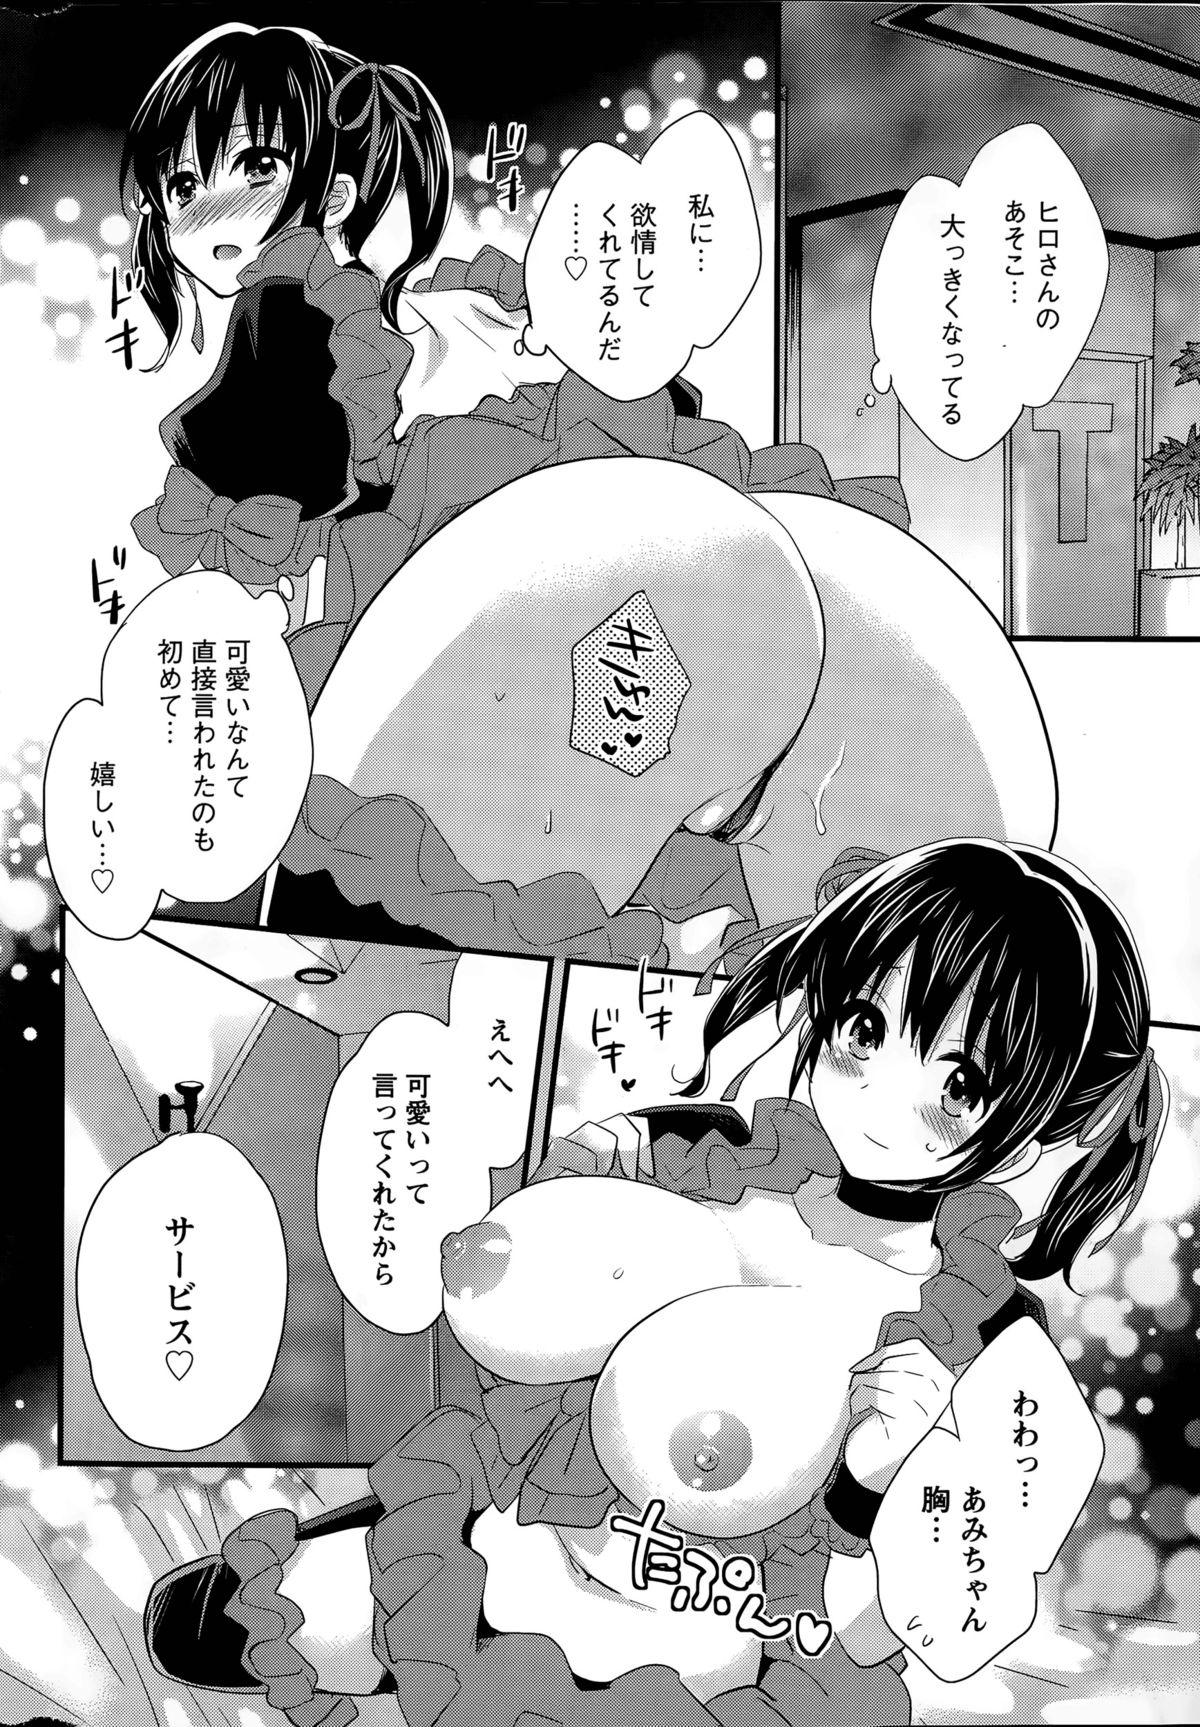 [Pon Takahanada] Otani-san no Cosplay Jijou Ch. 1-5 11